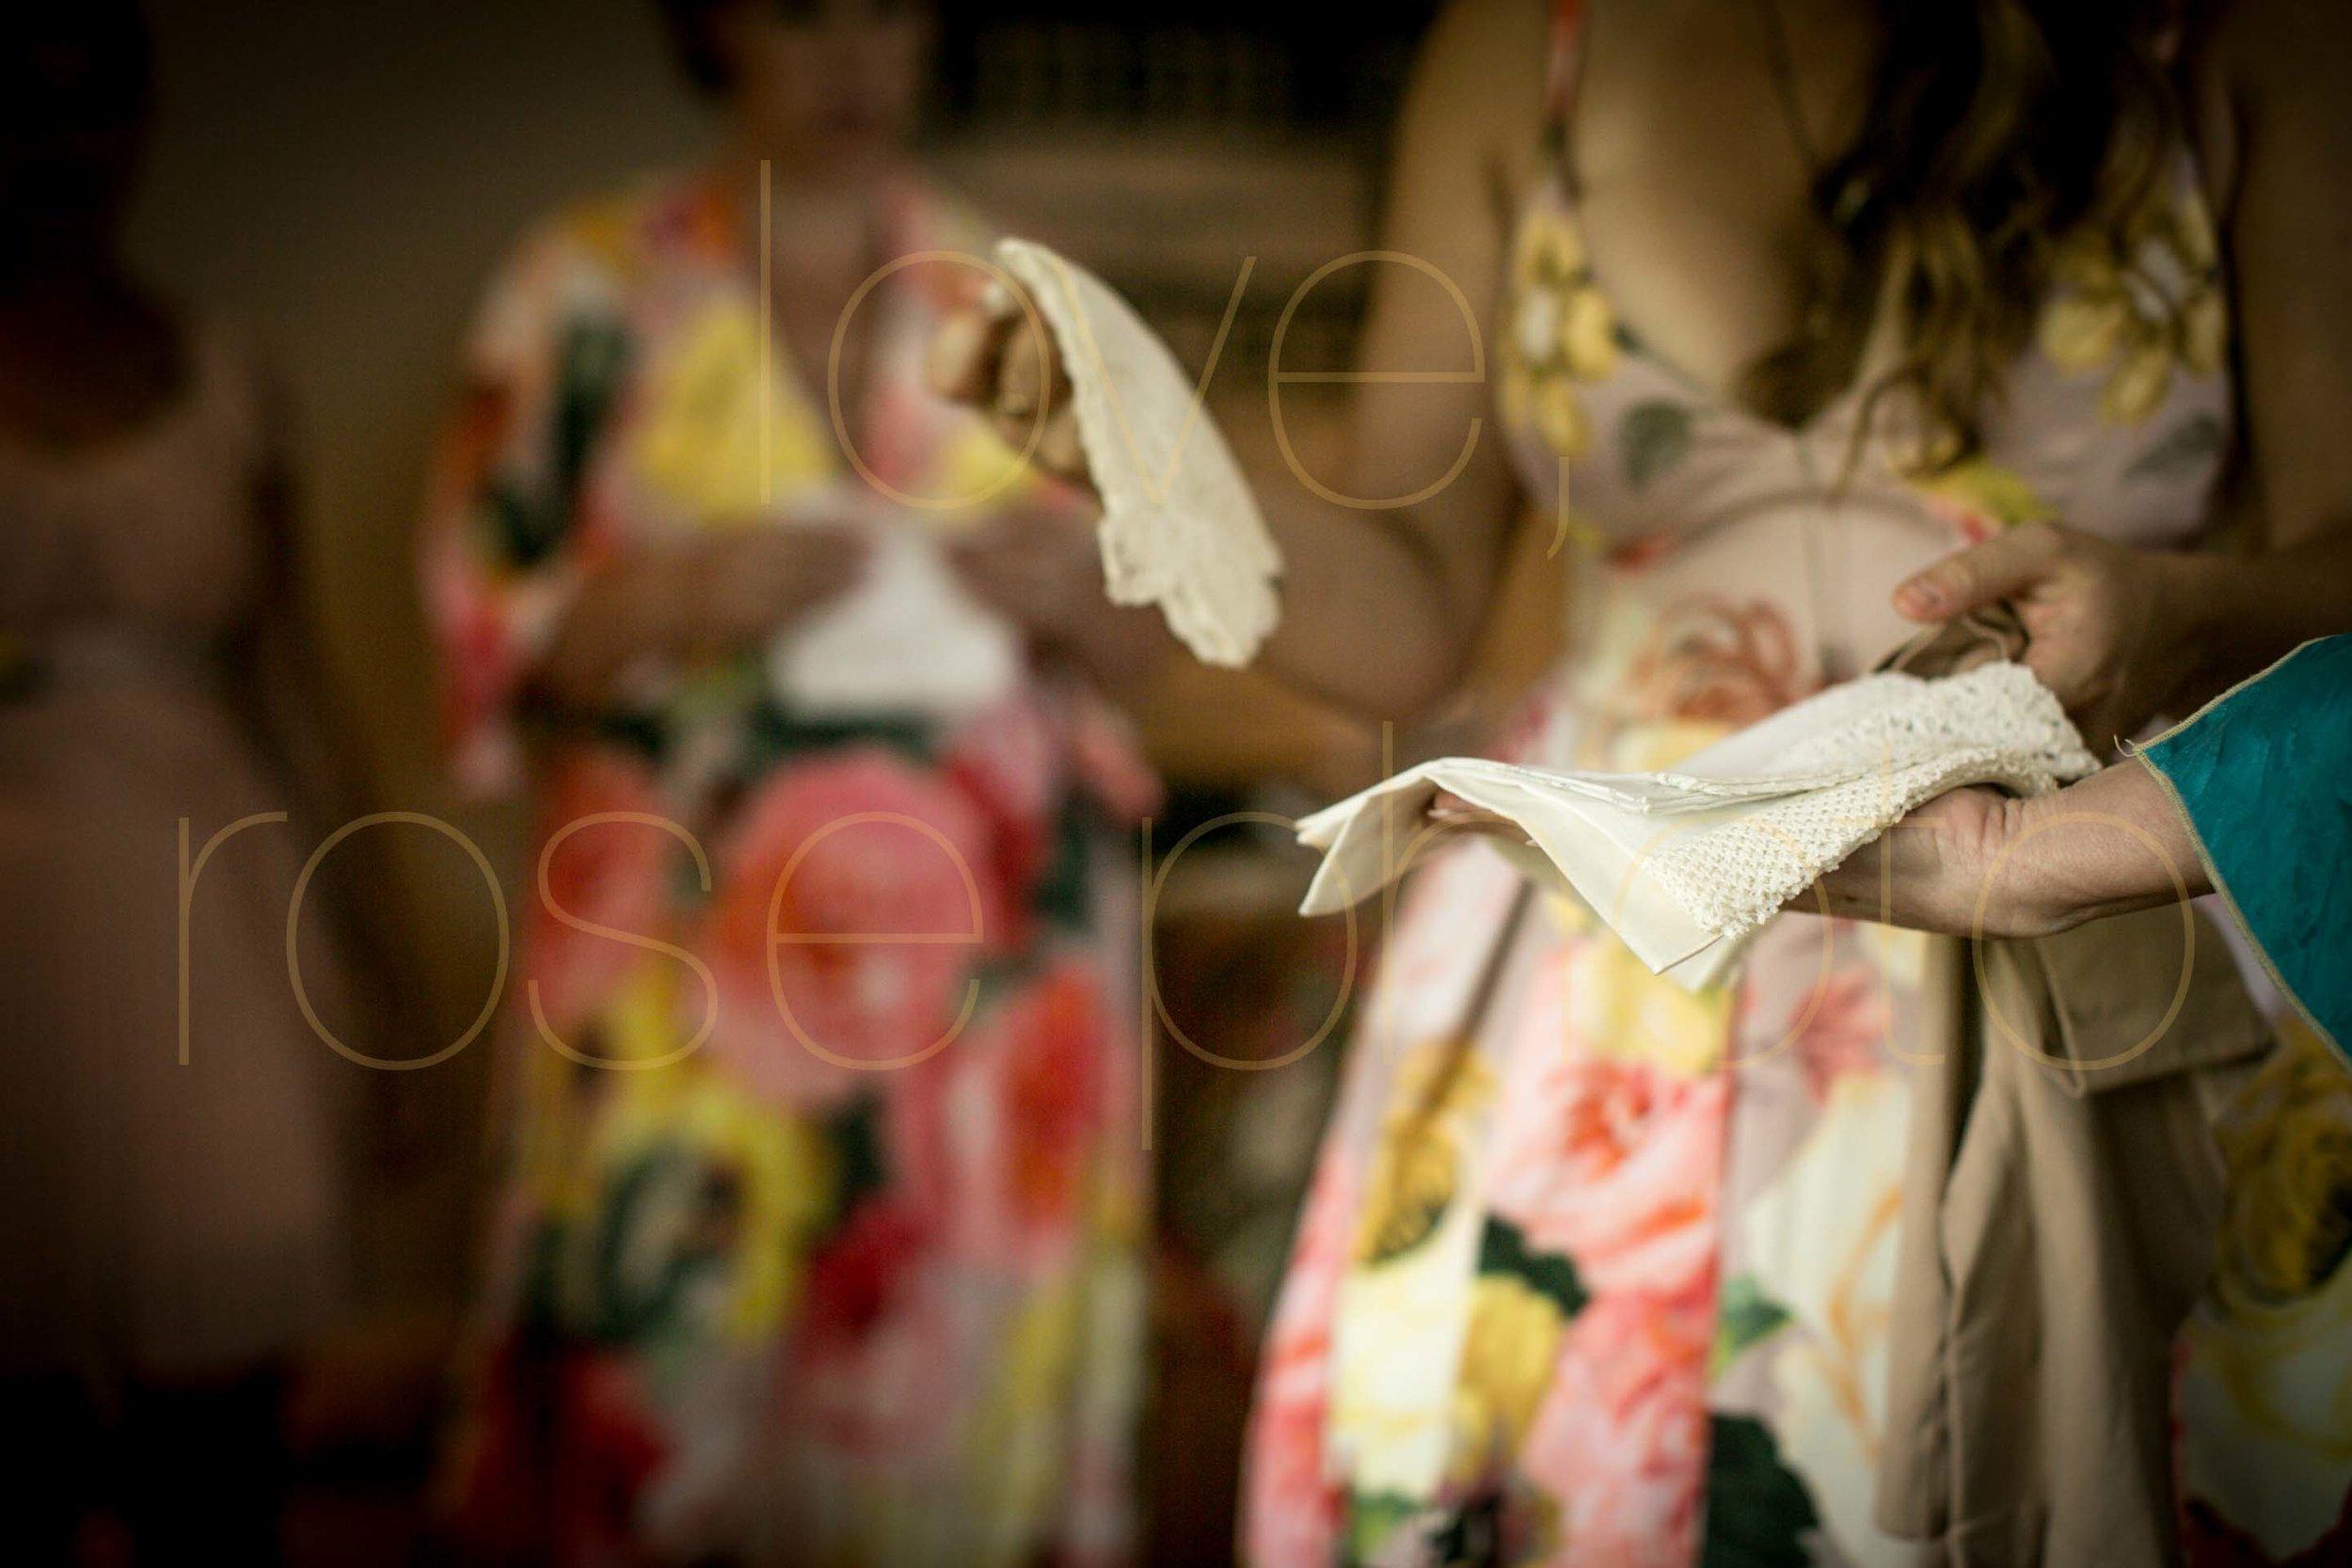 Rose Photo Asheville Wedding Photographer Nasheville Weddings Charleston Bride Chicago photojournalist weddings -14.jpg